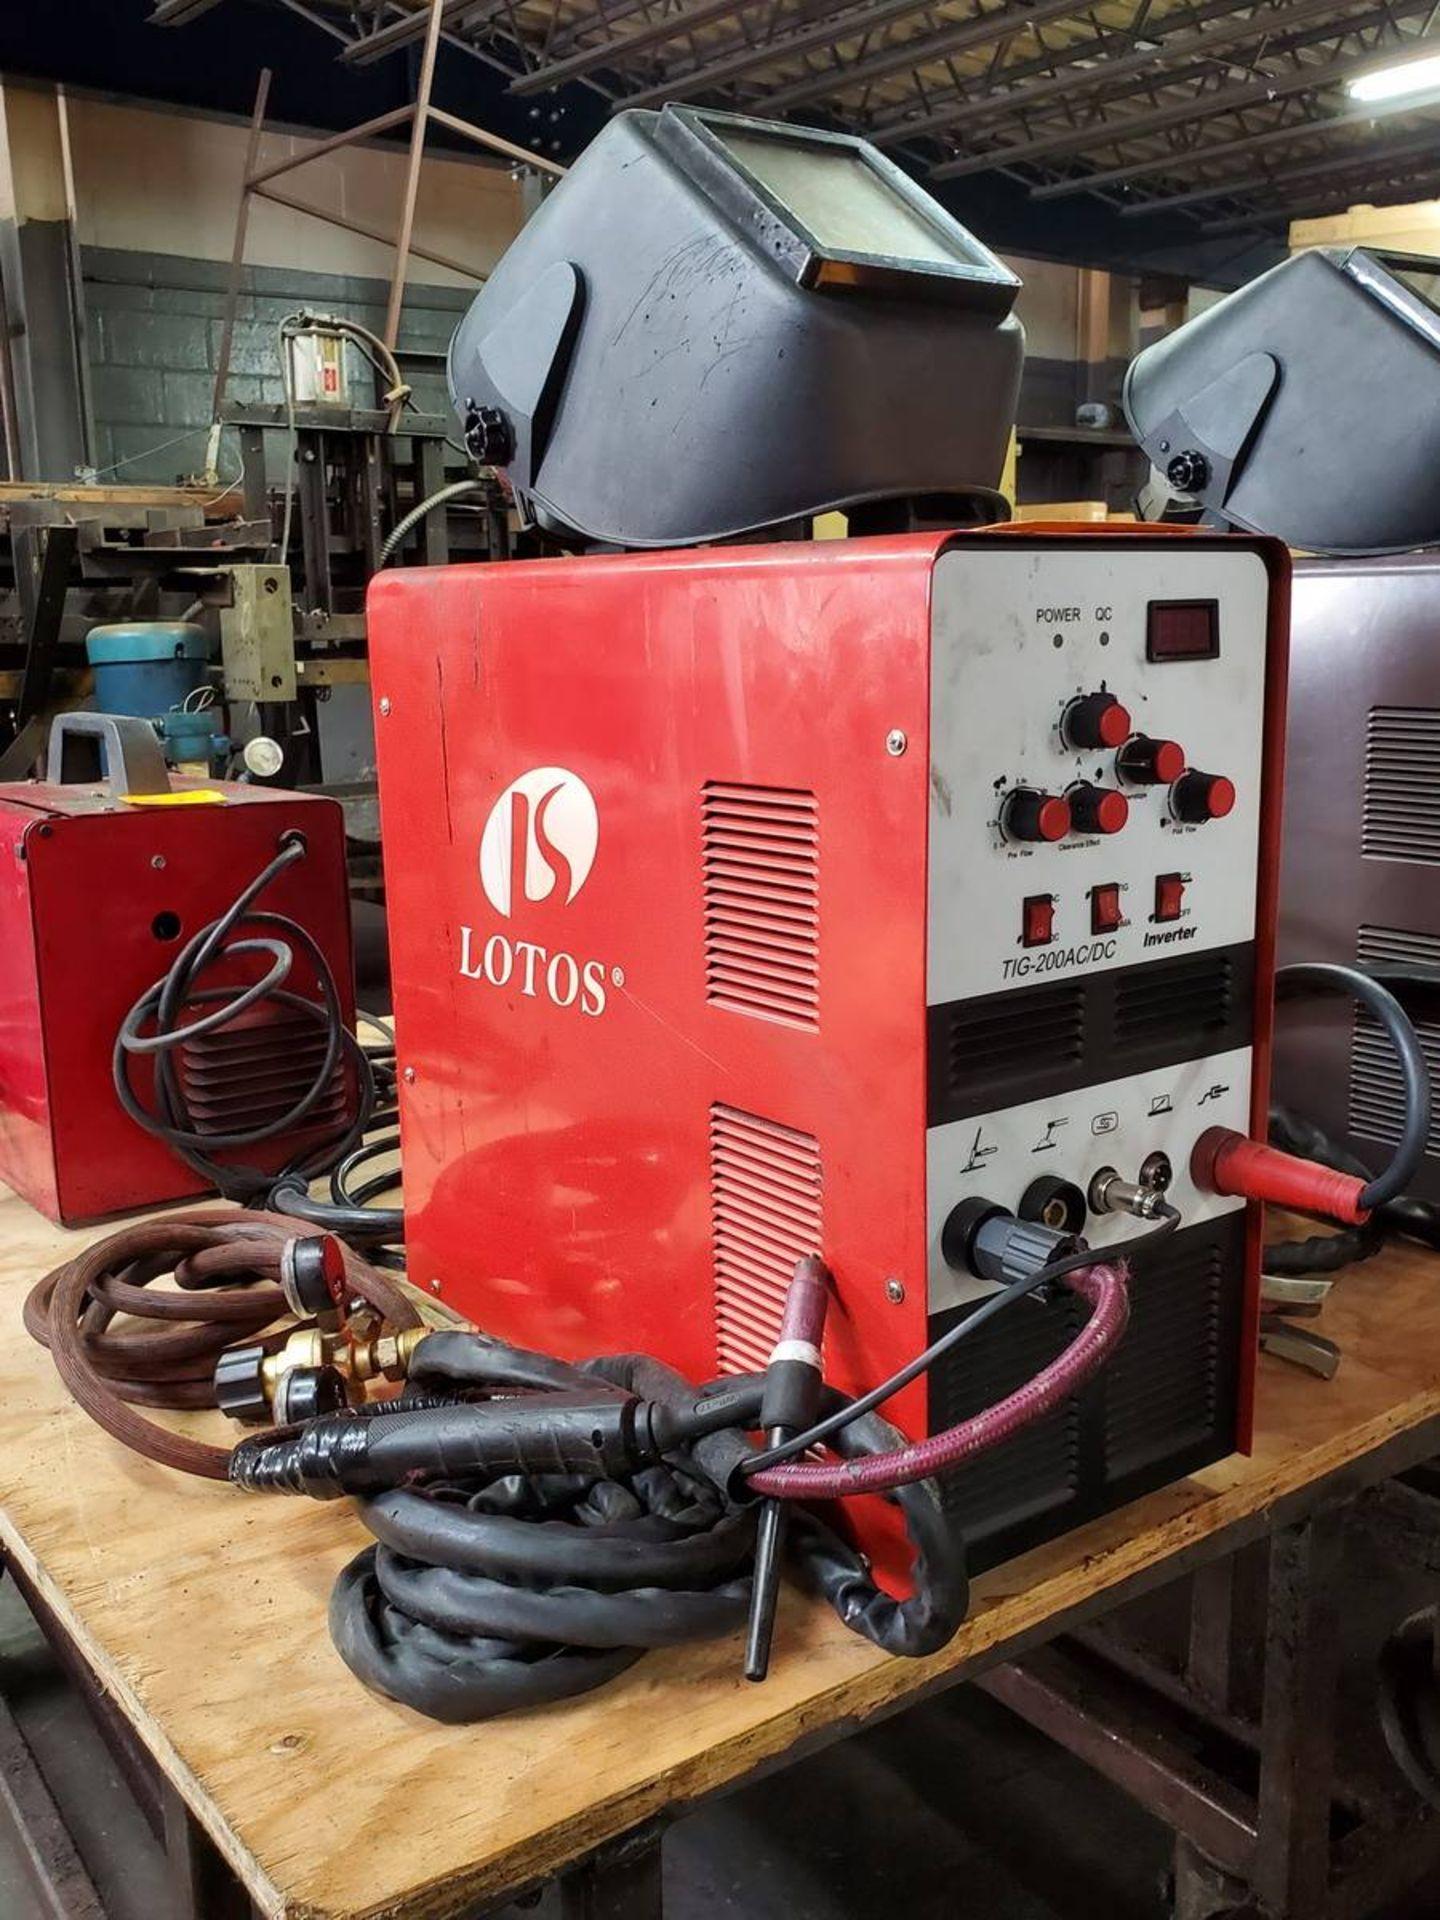 Lot 93 - Lotus Tig200ACDC Welder